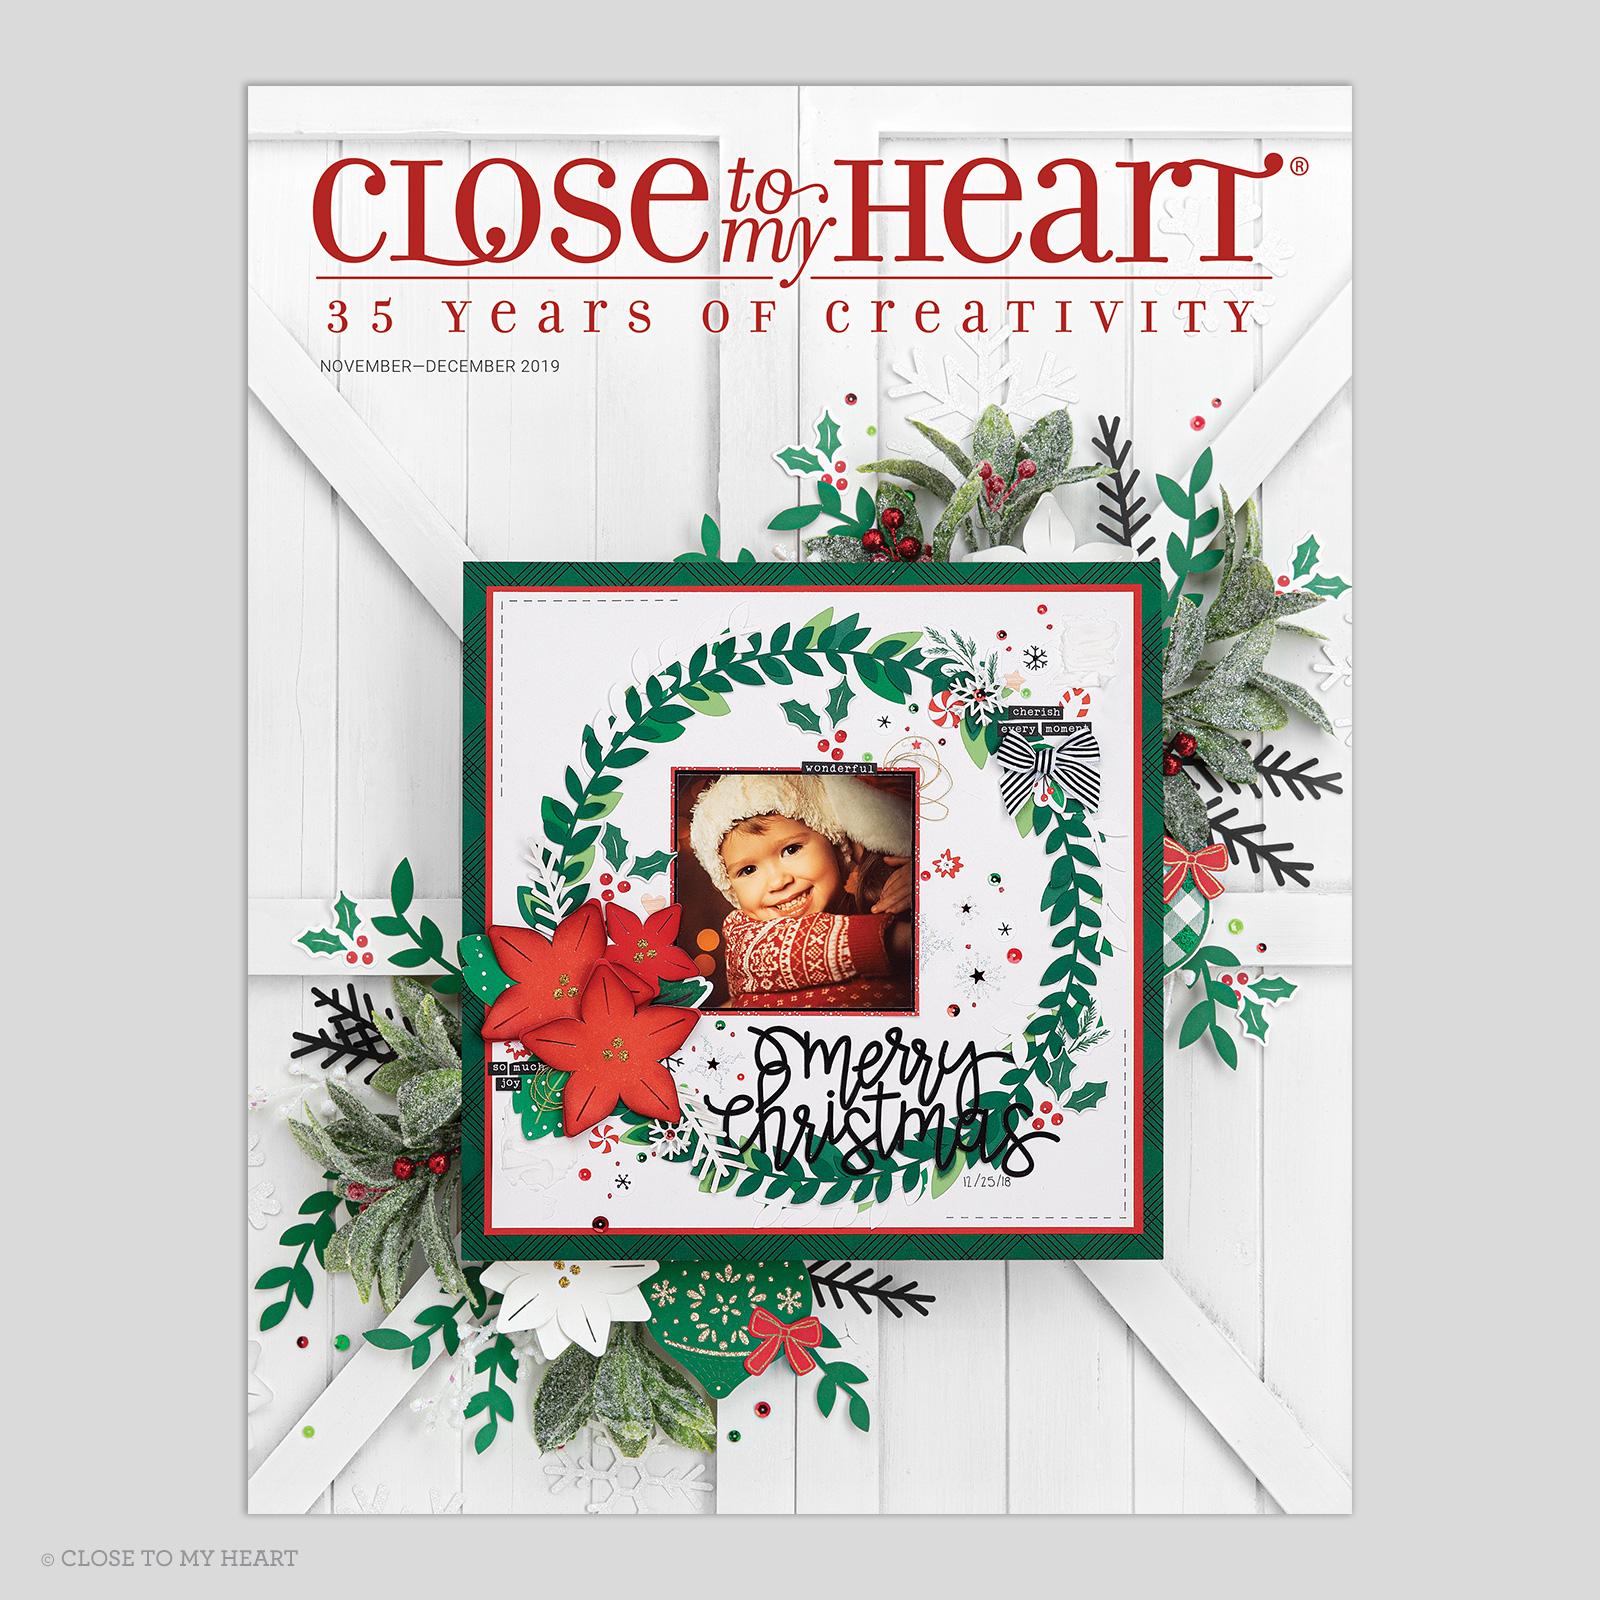 2019 November - December Catalog